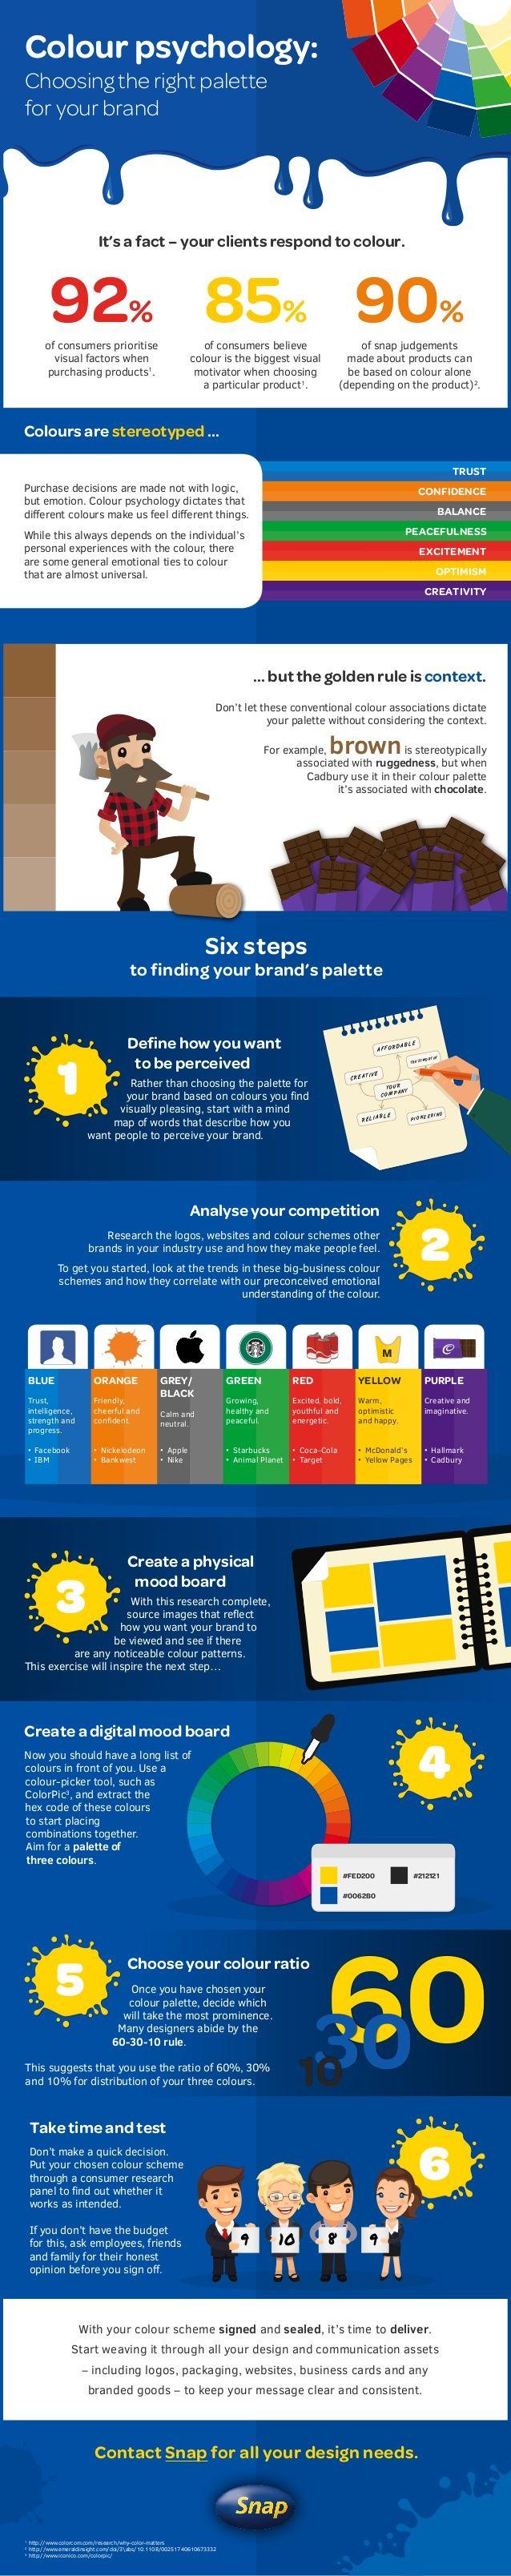 Psychology-Infographic-Psicología-del-color-para-tu-marca Psychology Infographic : Una infografía sobre la Psicología del color para tu marca.